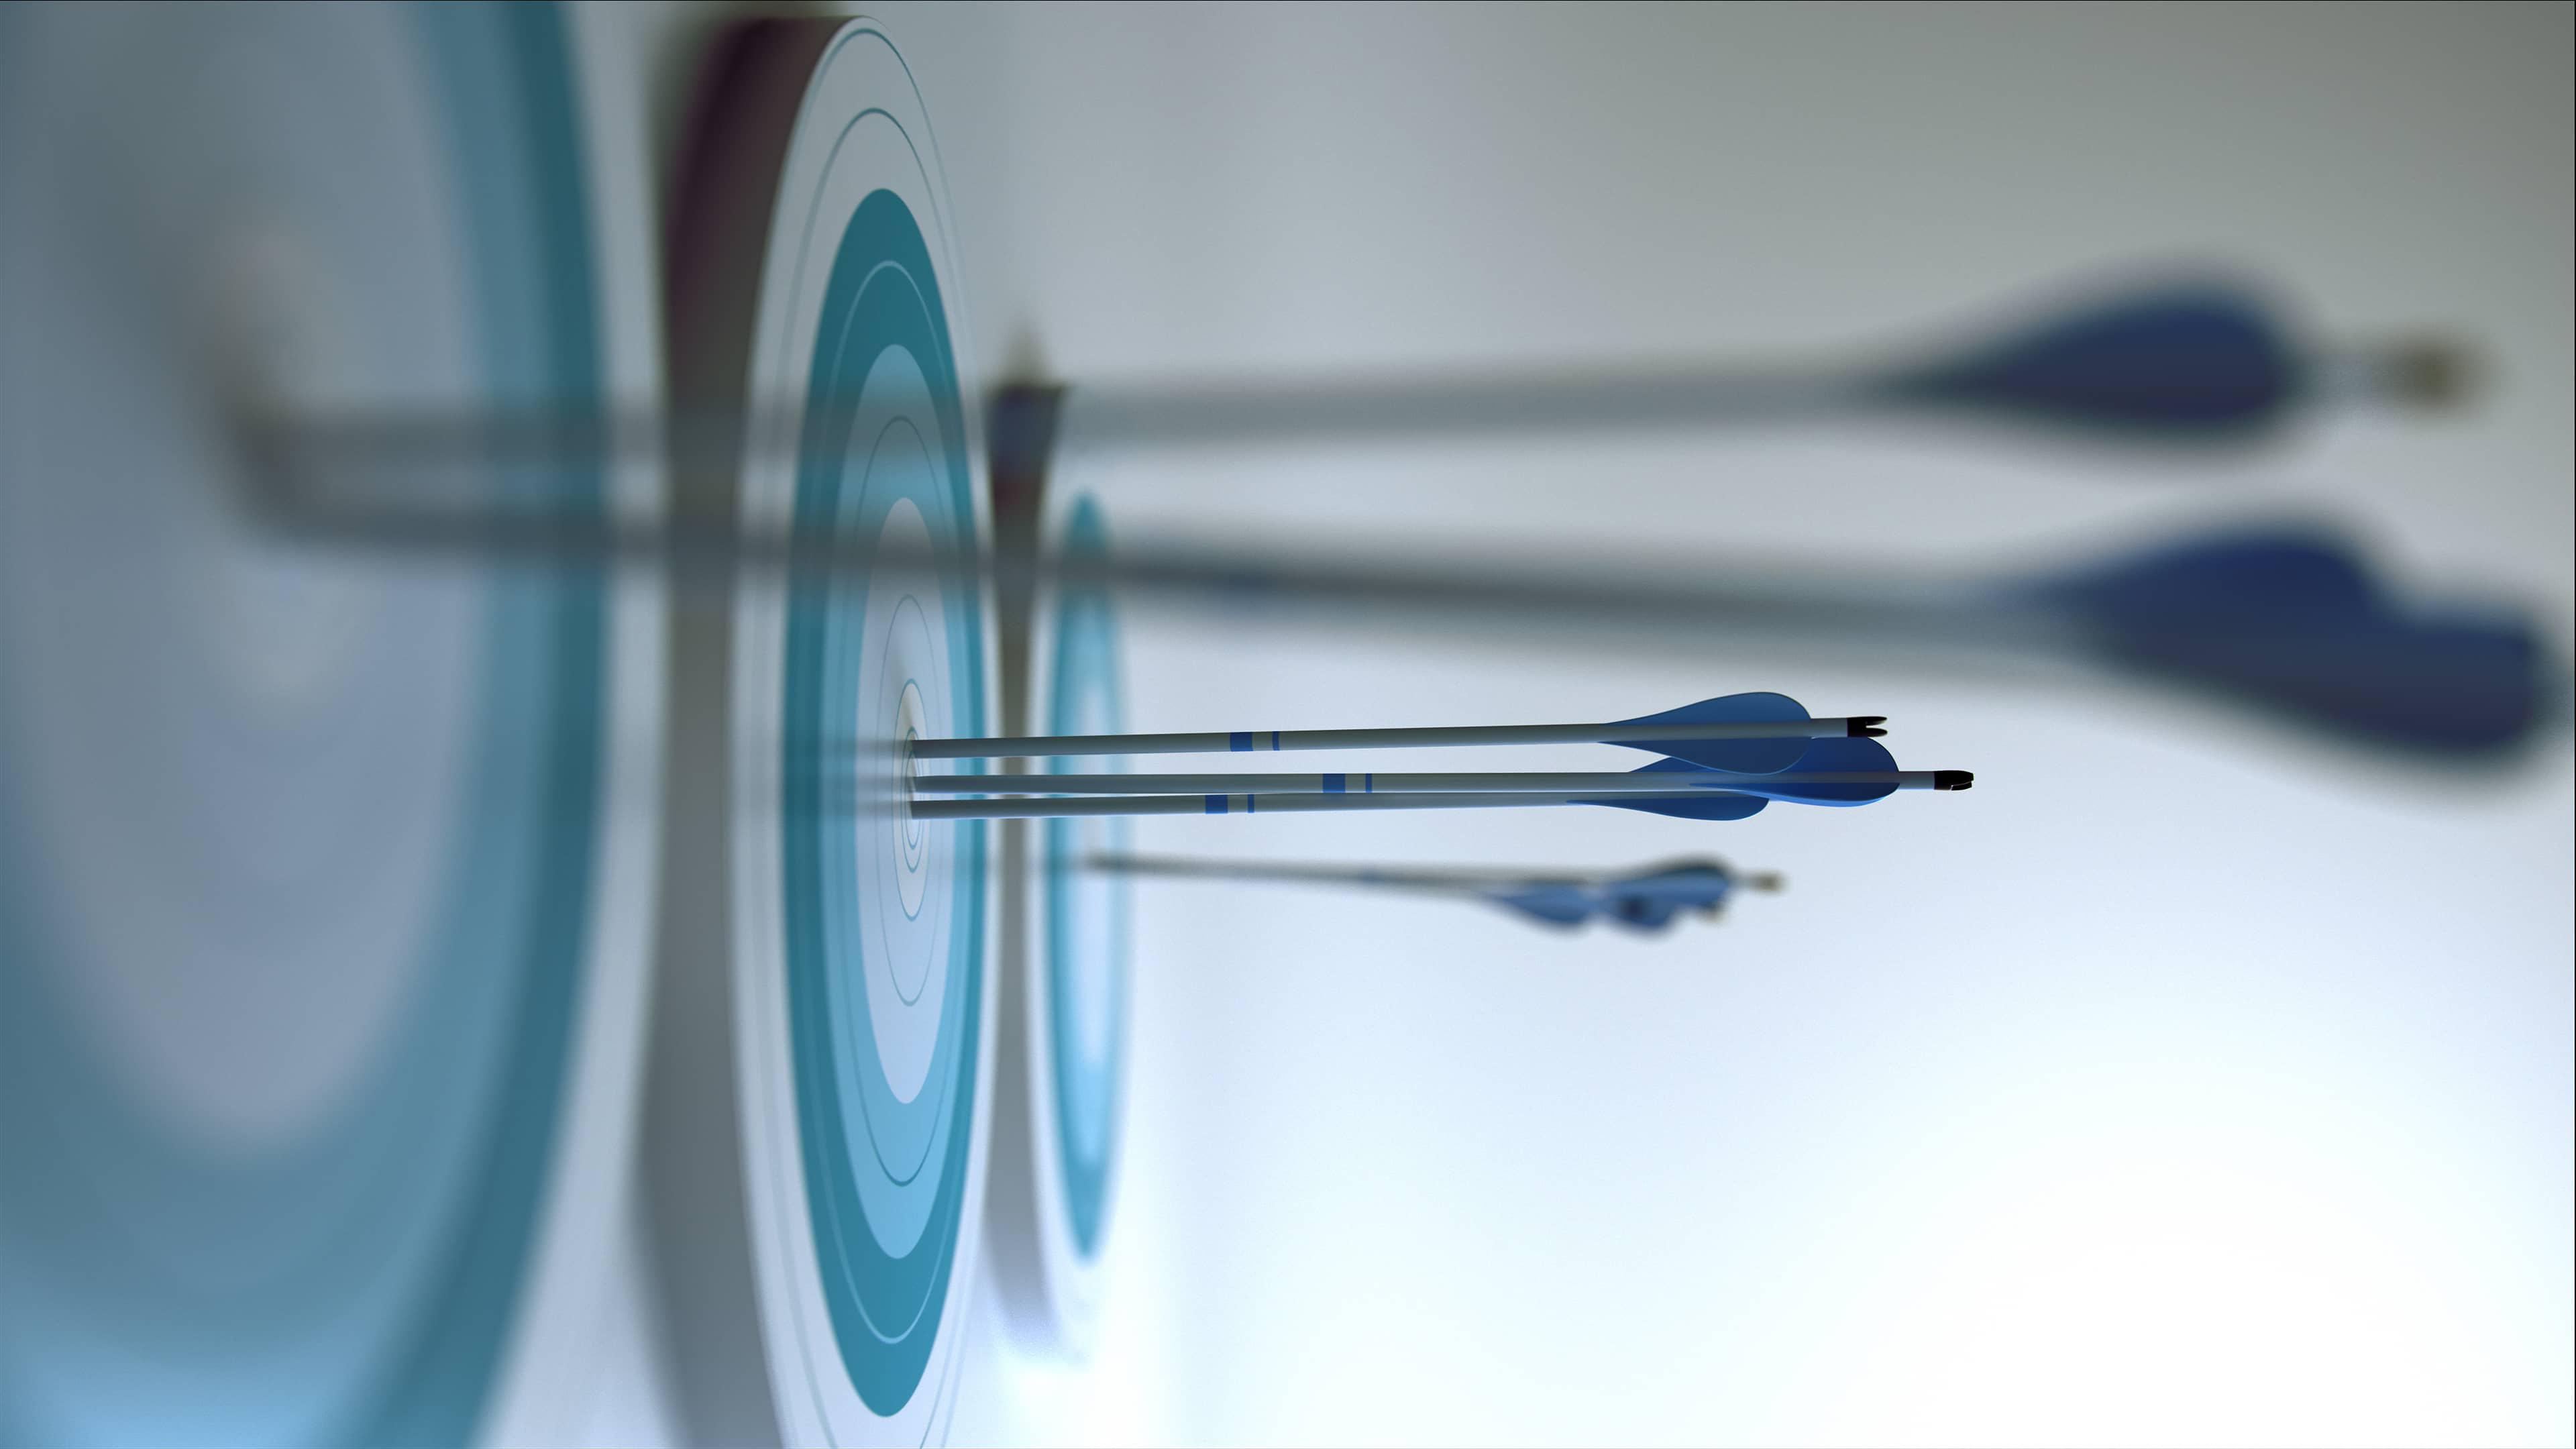 Don't just make success a target, enjoy the journey